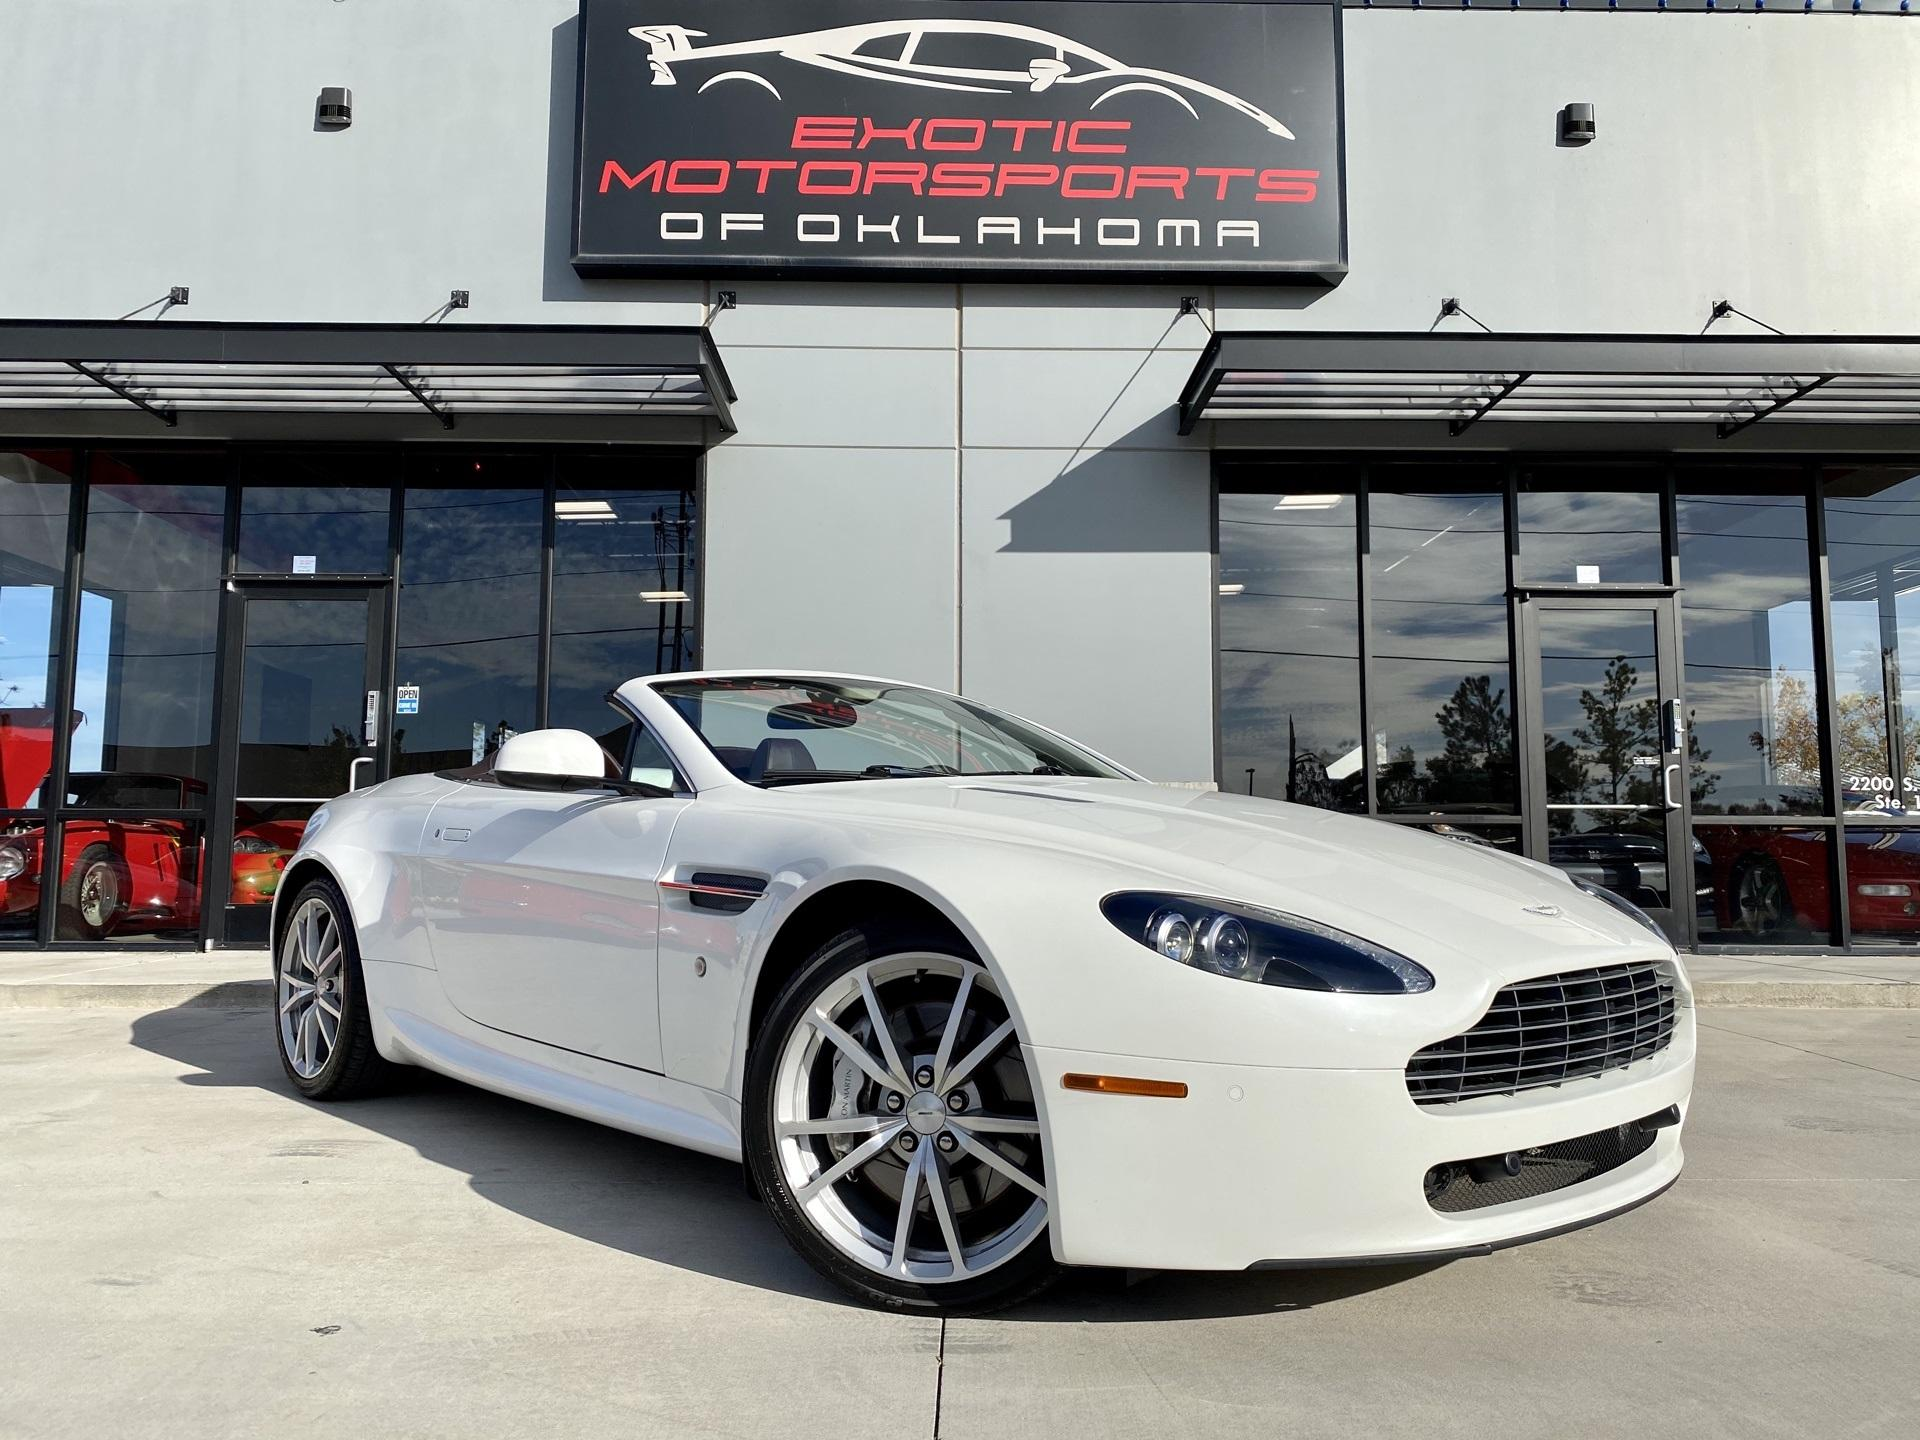 Used 2010 Aston Martin V8 Vantage Base For Sale Sold Exotic Motorsports Of Oklahoma Stock P139